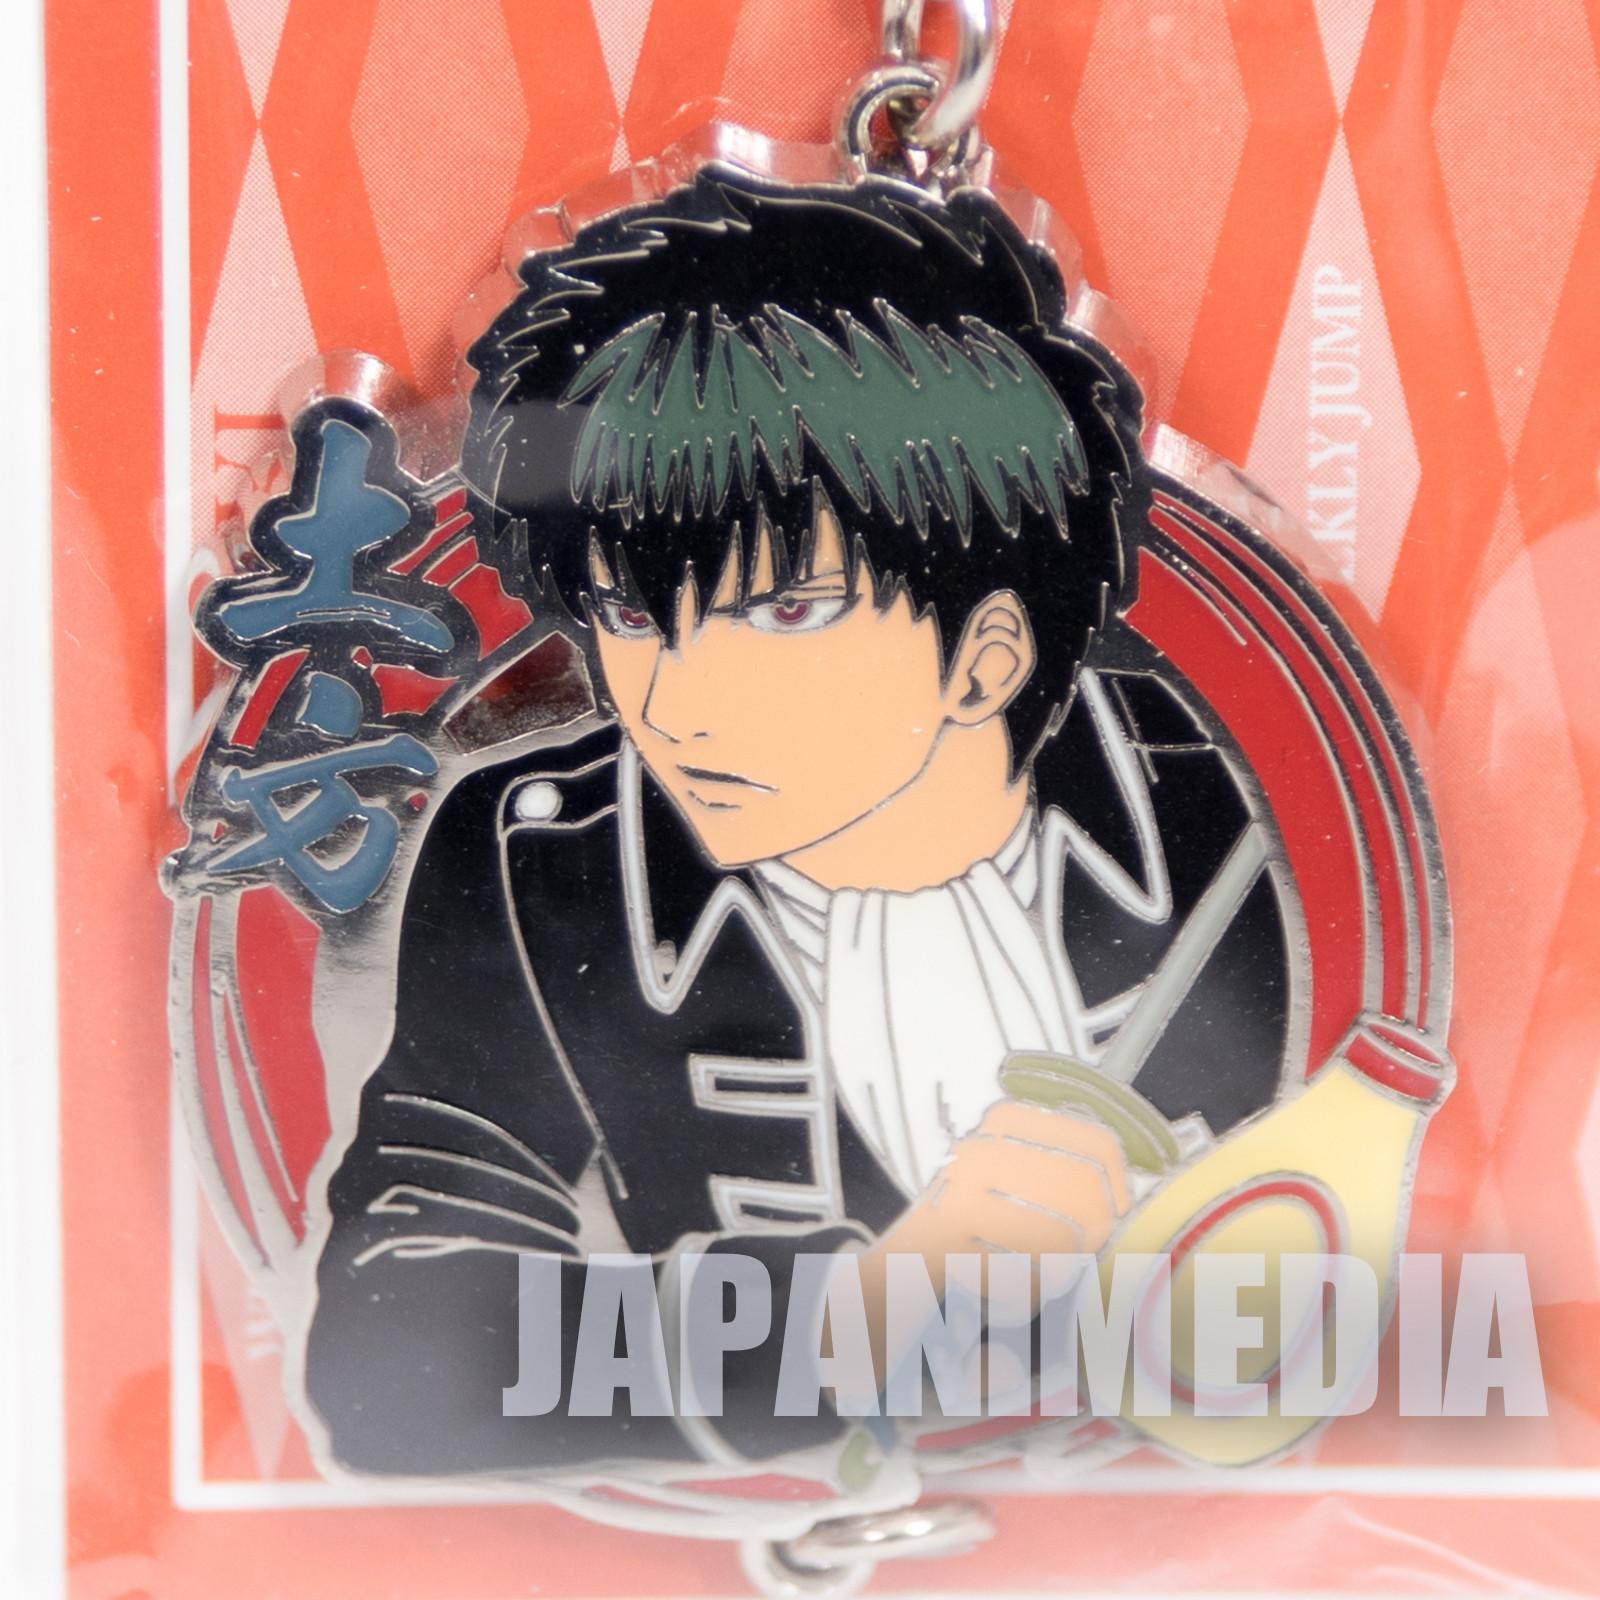 Gintama Toushirou Hijikata Metal Charm Collection Weekly Jump Character JAPAN